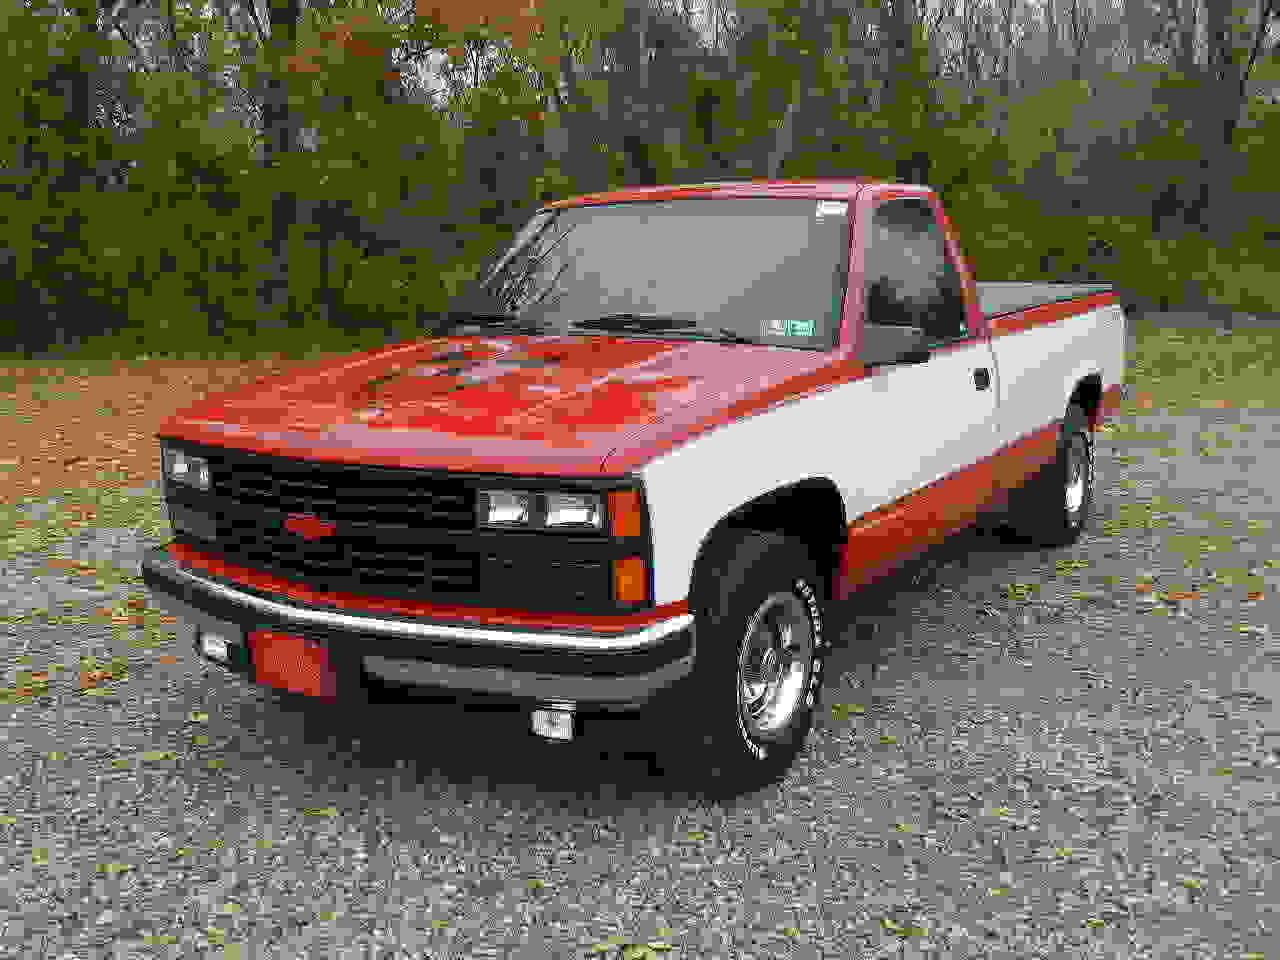 1992 Chevrolet Silverado C1500 Pickup Truck - SS350 for ...